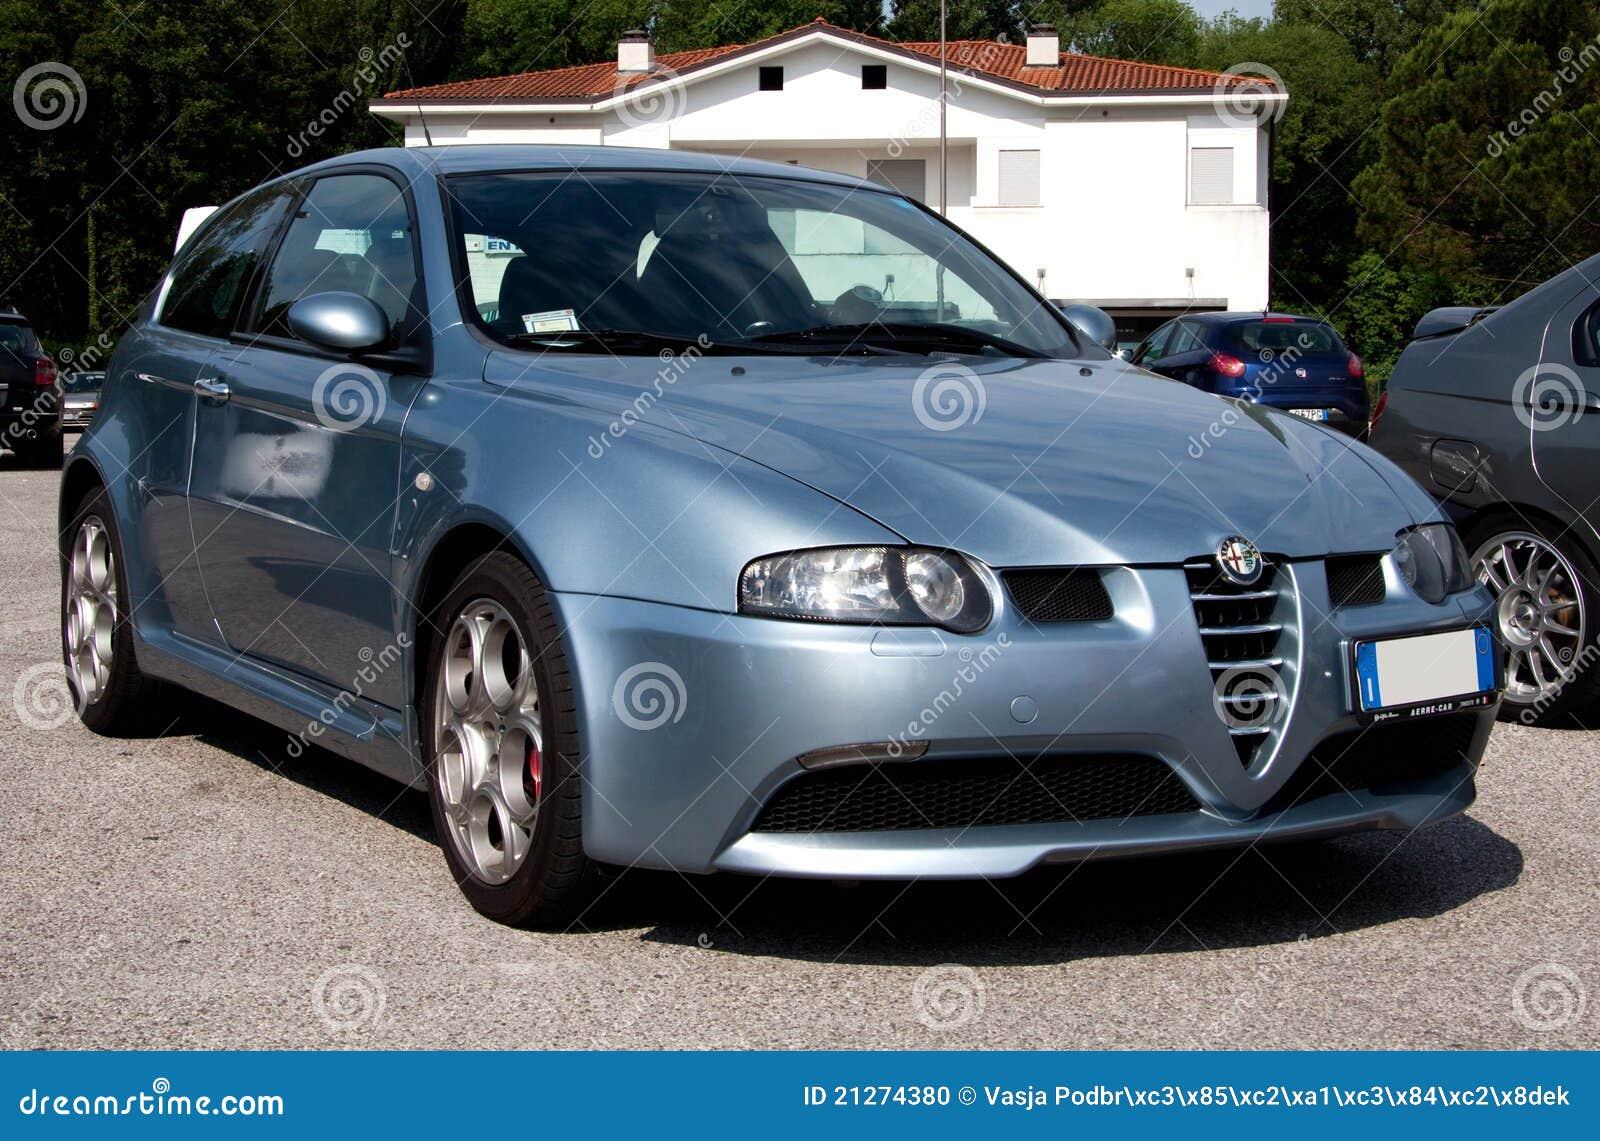 Alfa Romeo 147 Gta Imagem Editorial Imagem De Romeo 21274380